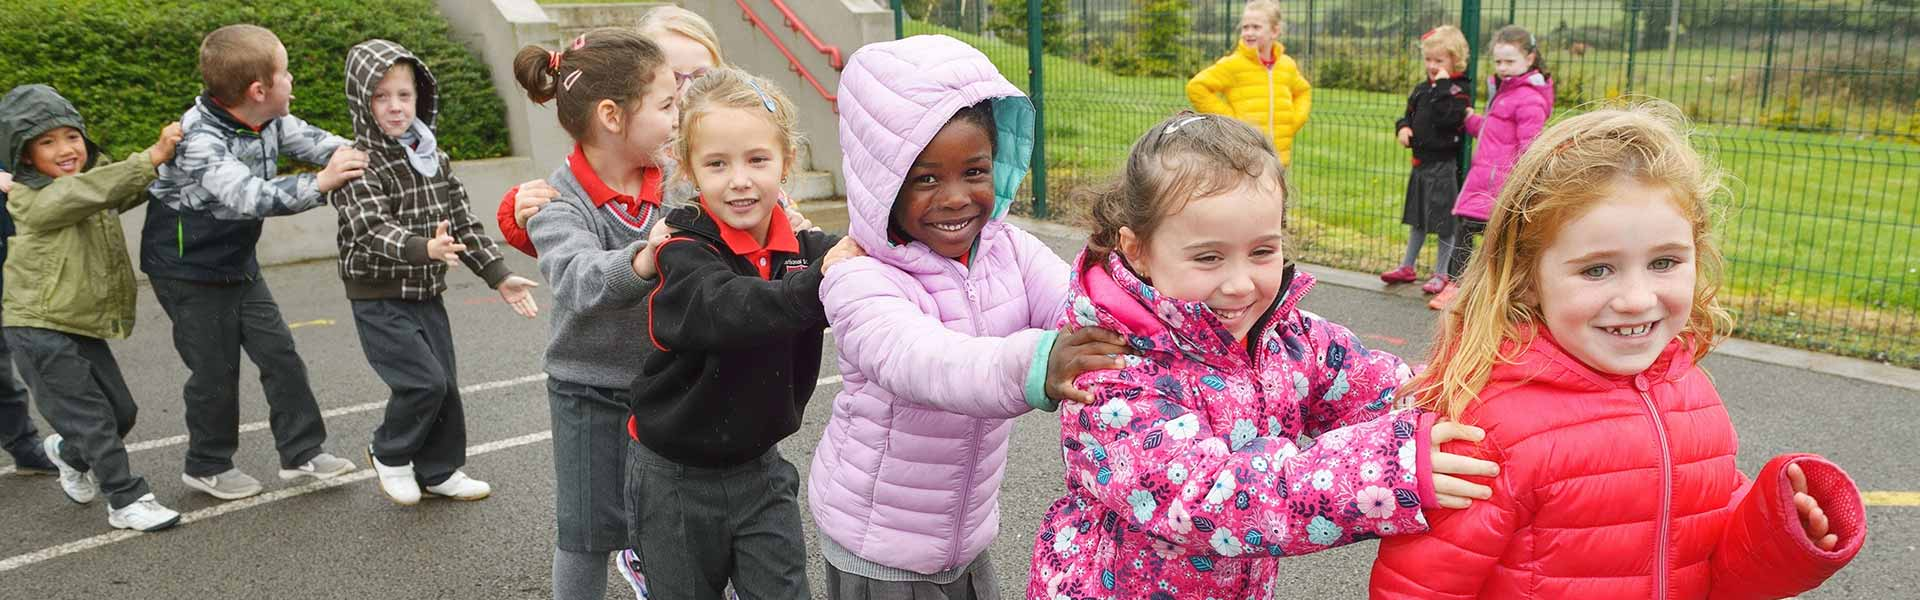 Ennis National School | Catholic Primary School | Co. Clare